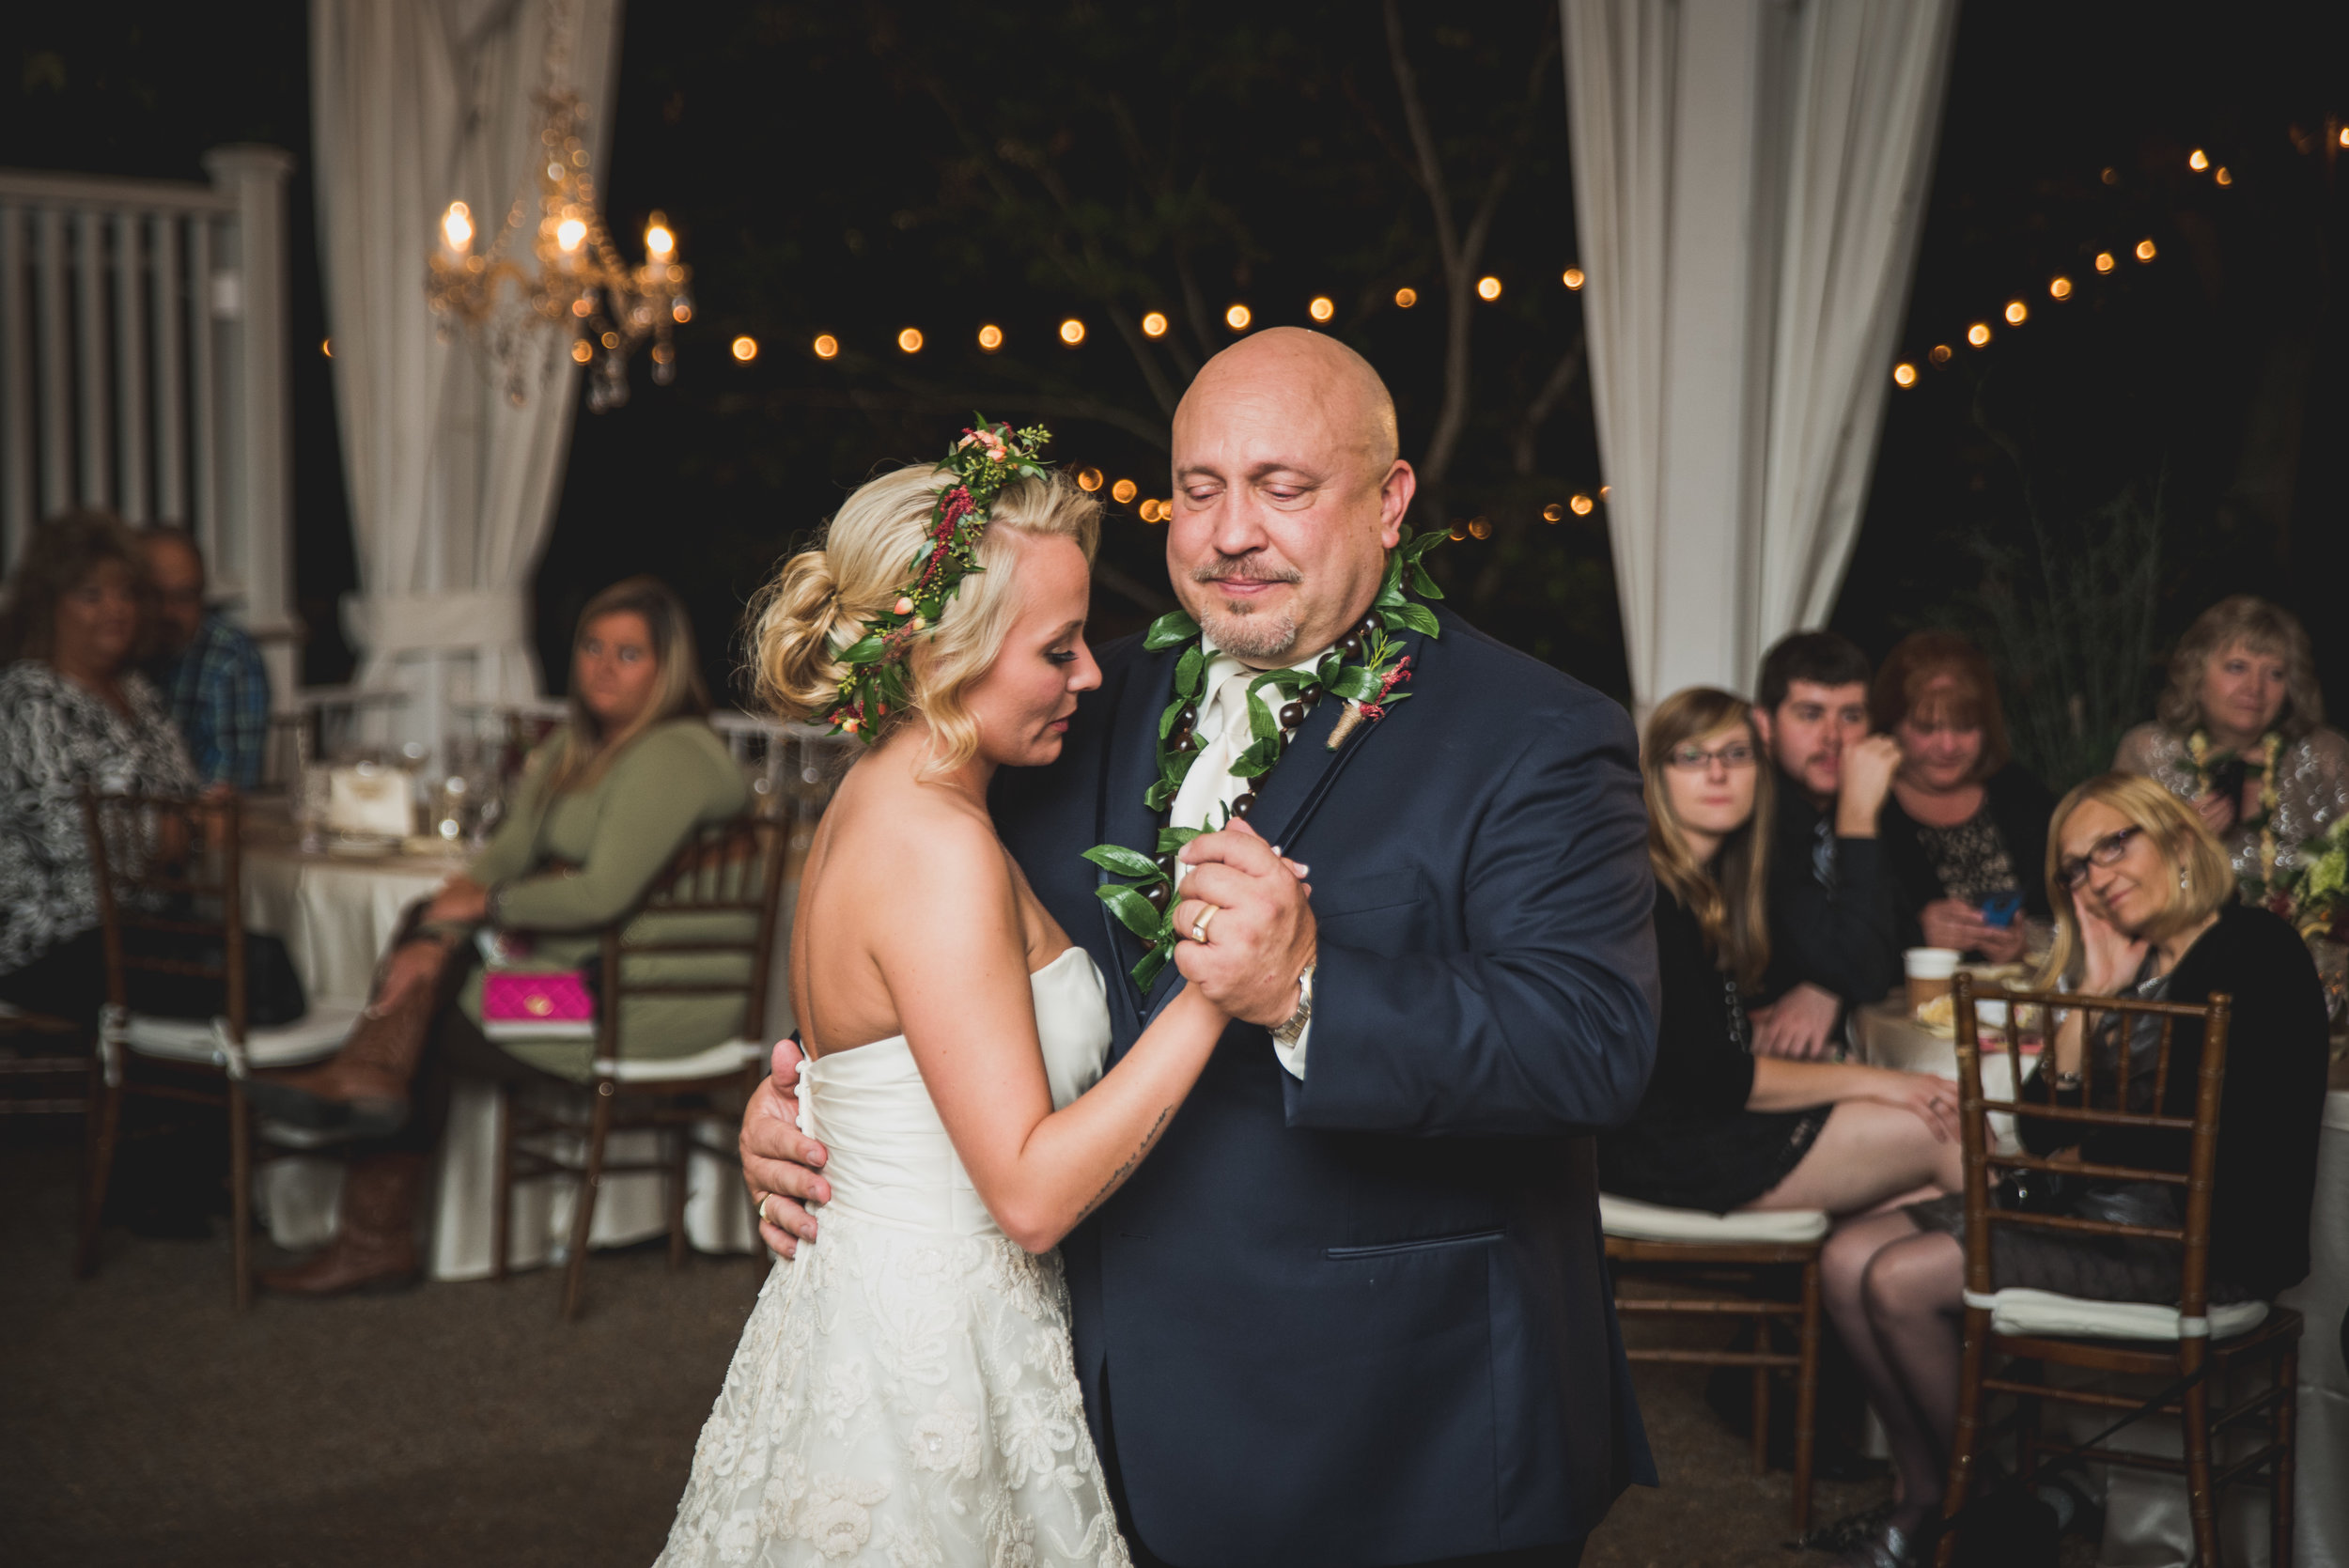 Nashville-wedding-photographers-CJ's-Off-The-Square-68.JPG